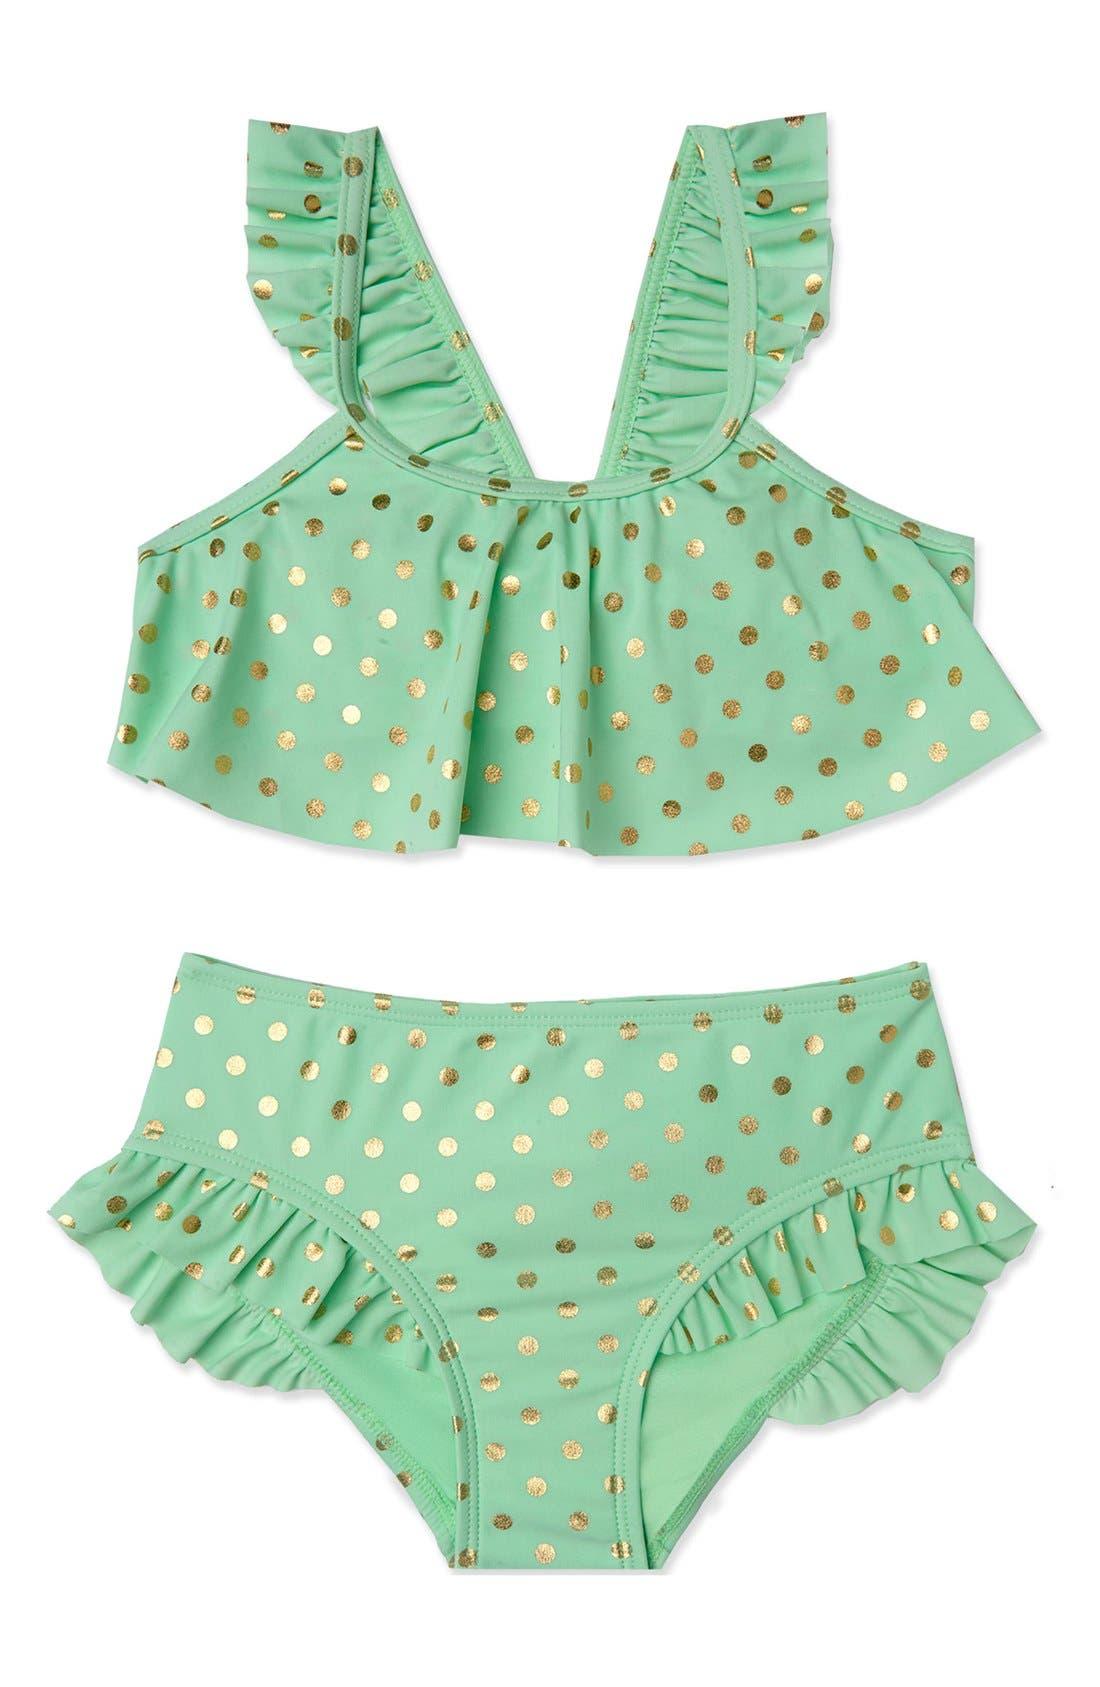 Alternate Image 1 Selected - Hula Star 'Milkshake' Two-Piece Swimsuit (Toddler Girls & Little Girls)